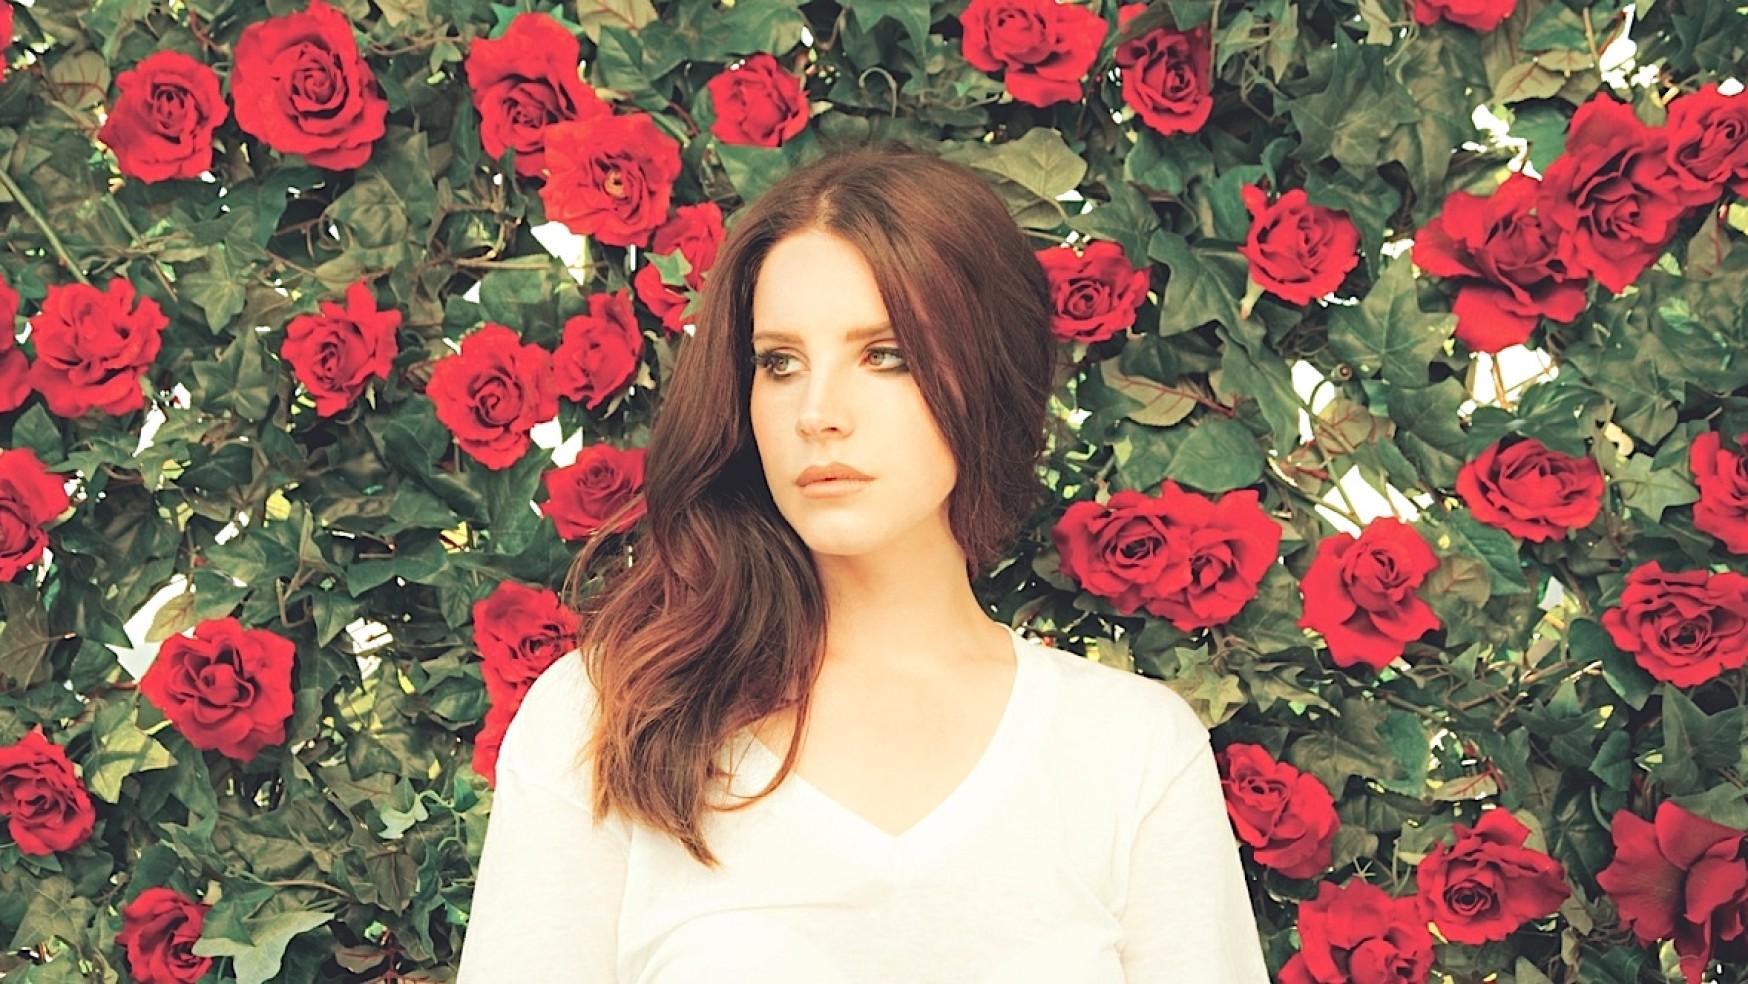 Nieuwe muziek: Lana Del Rey